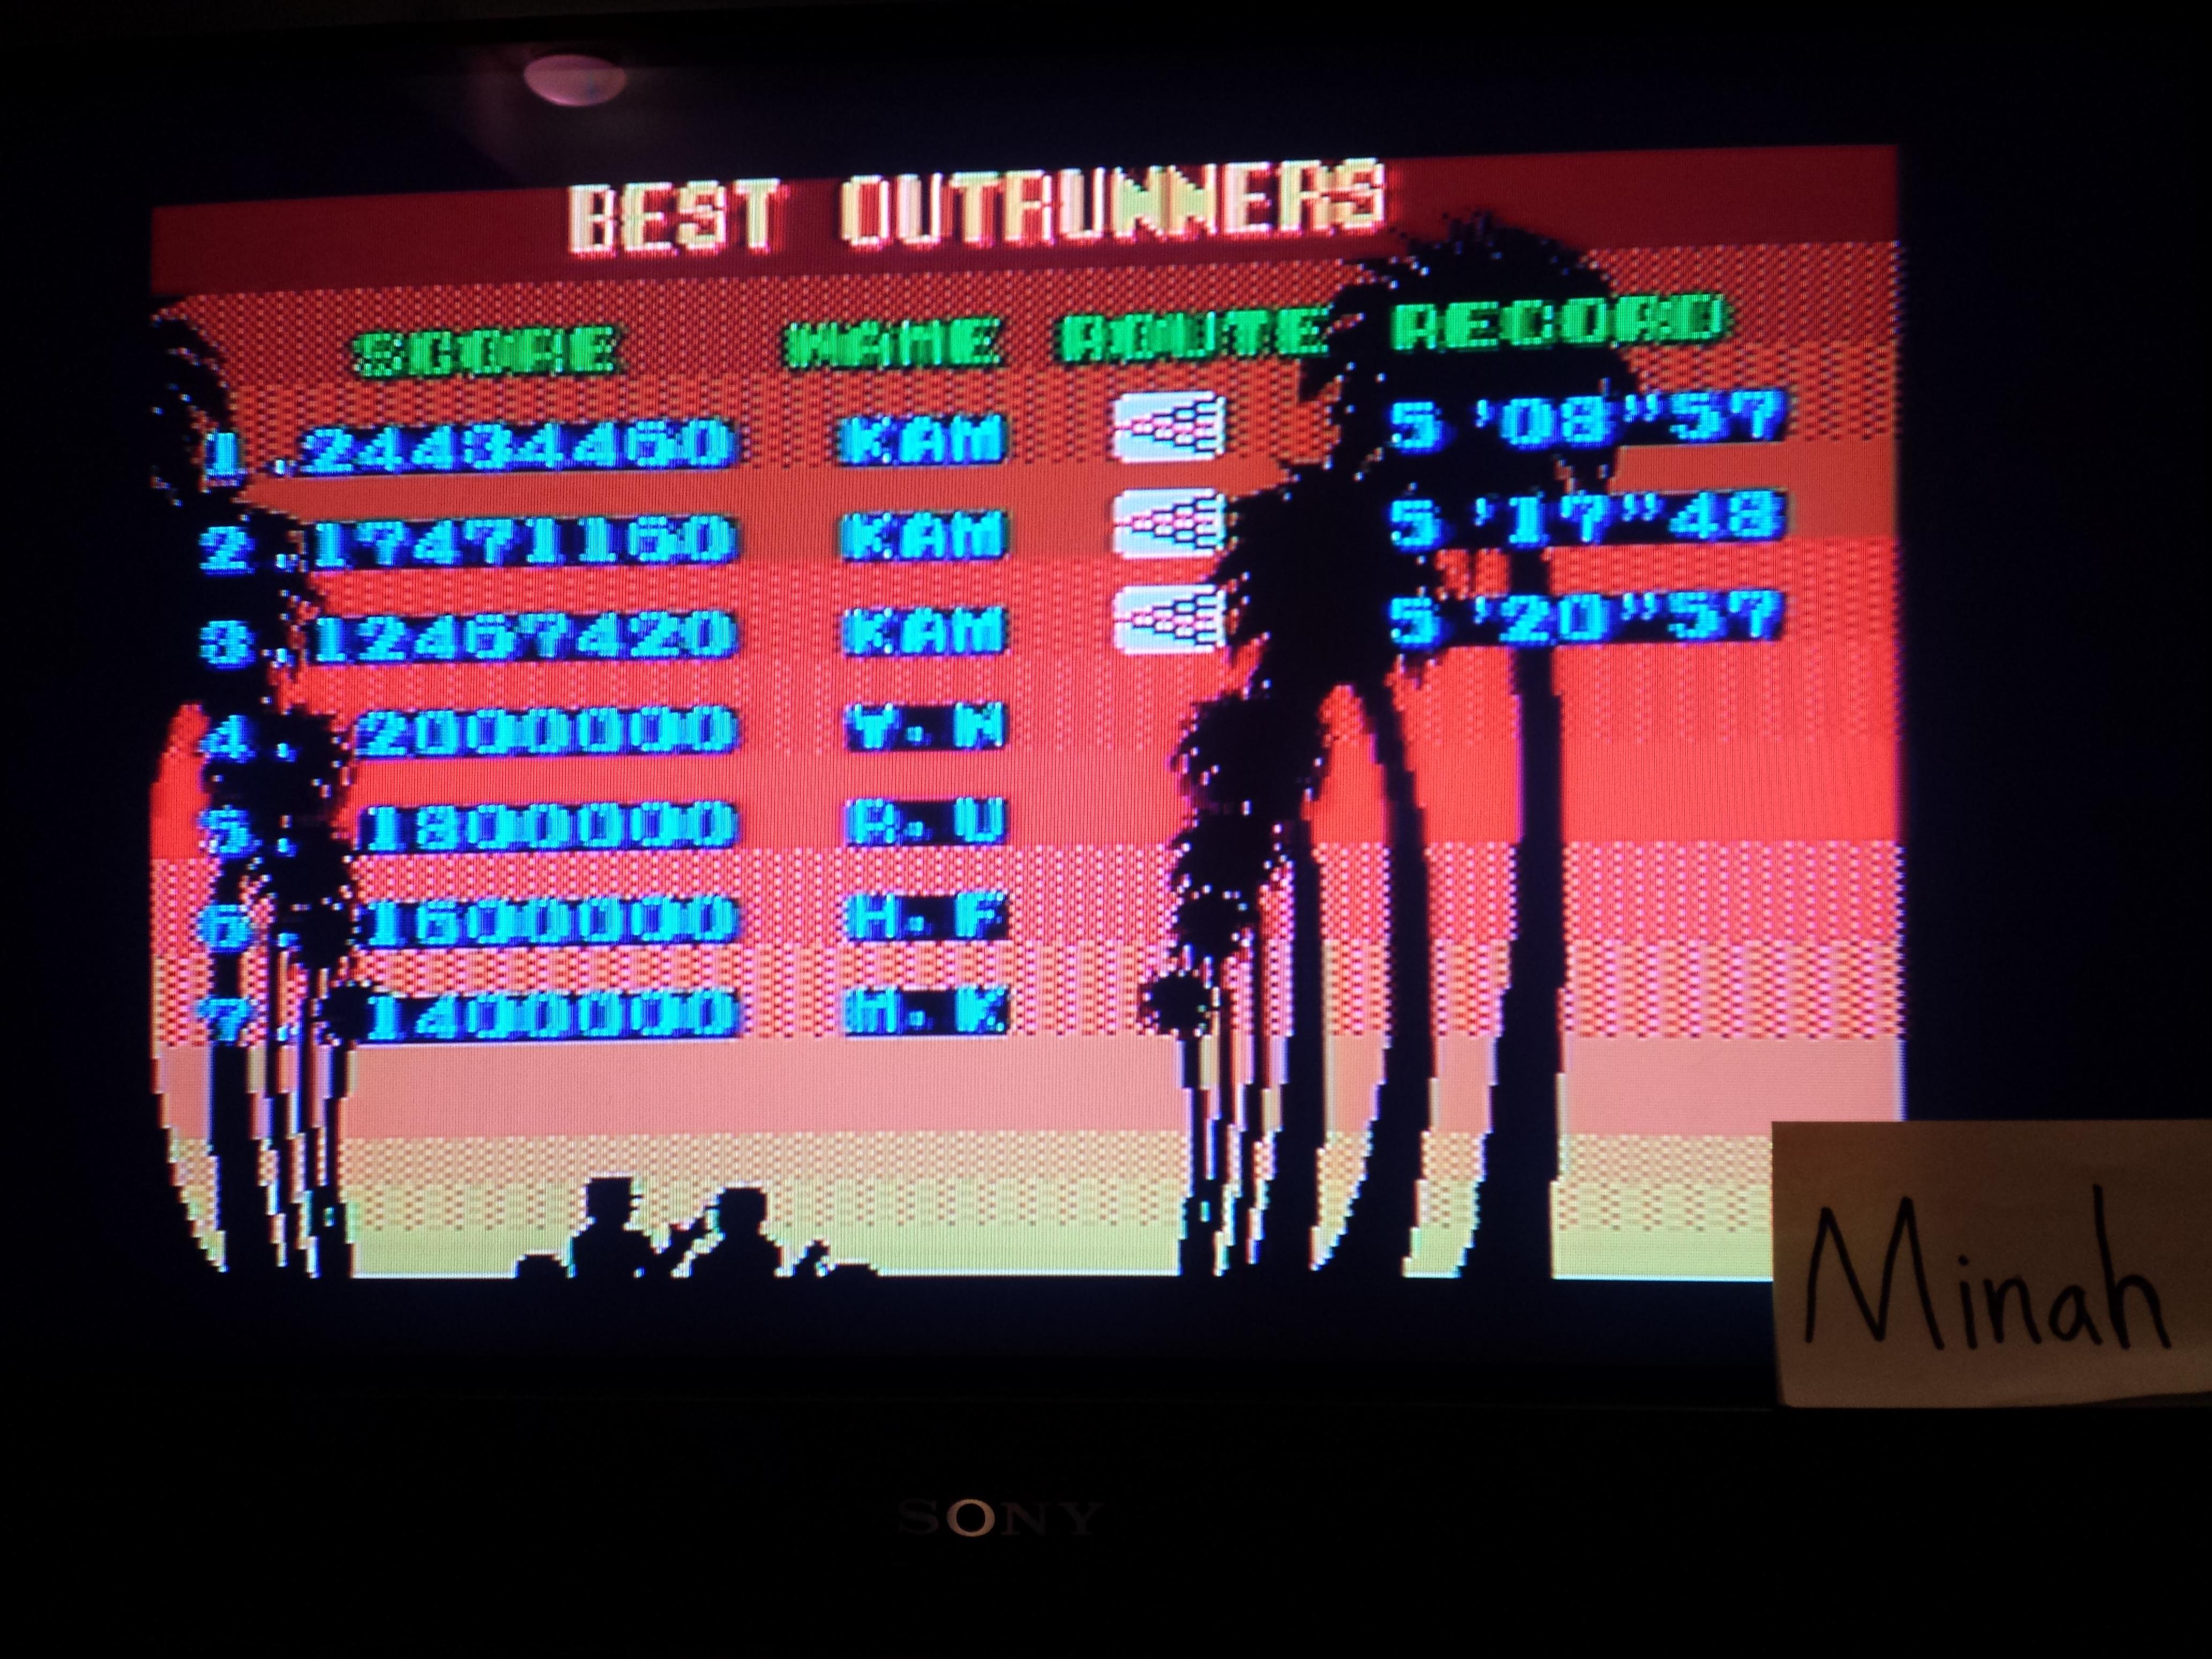 Outrun 24,434,460 points